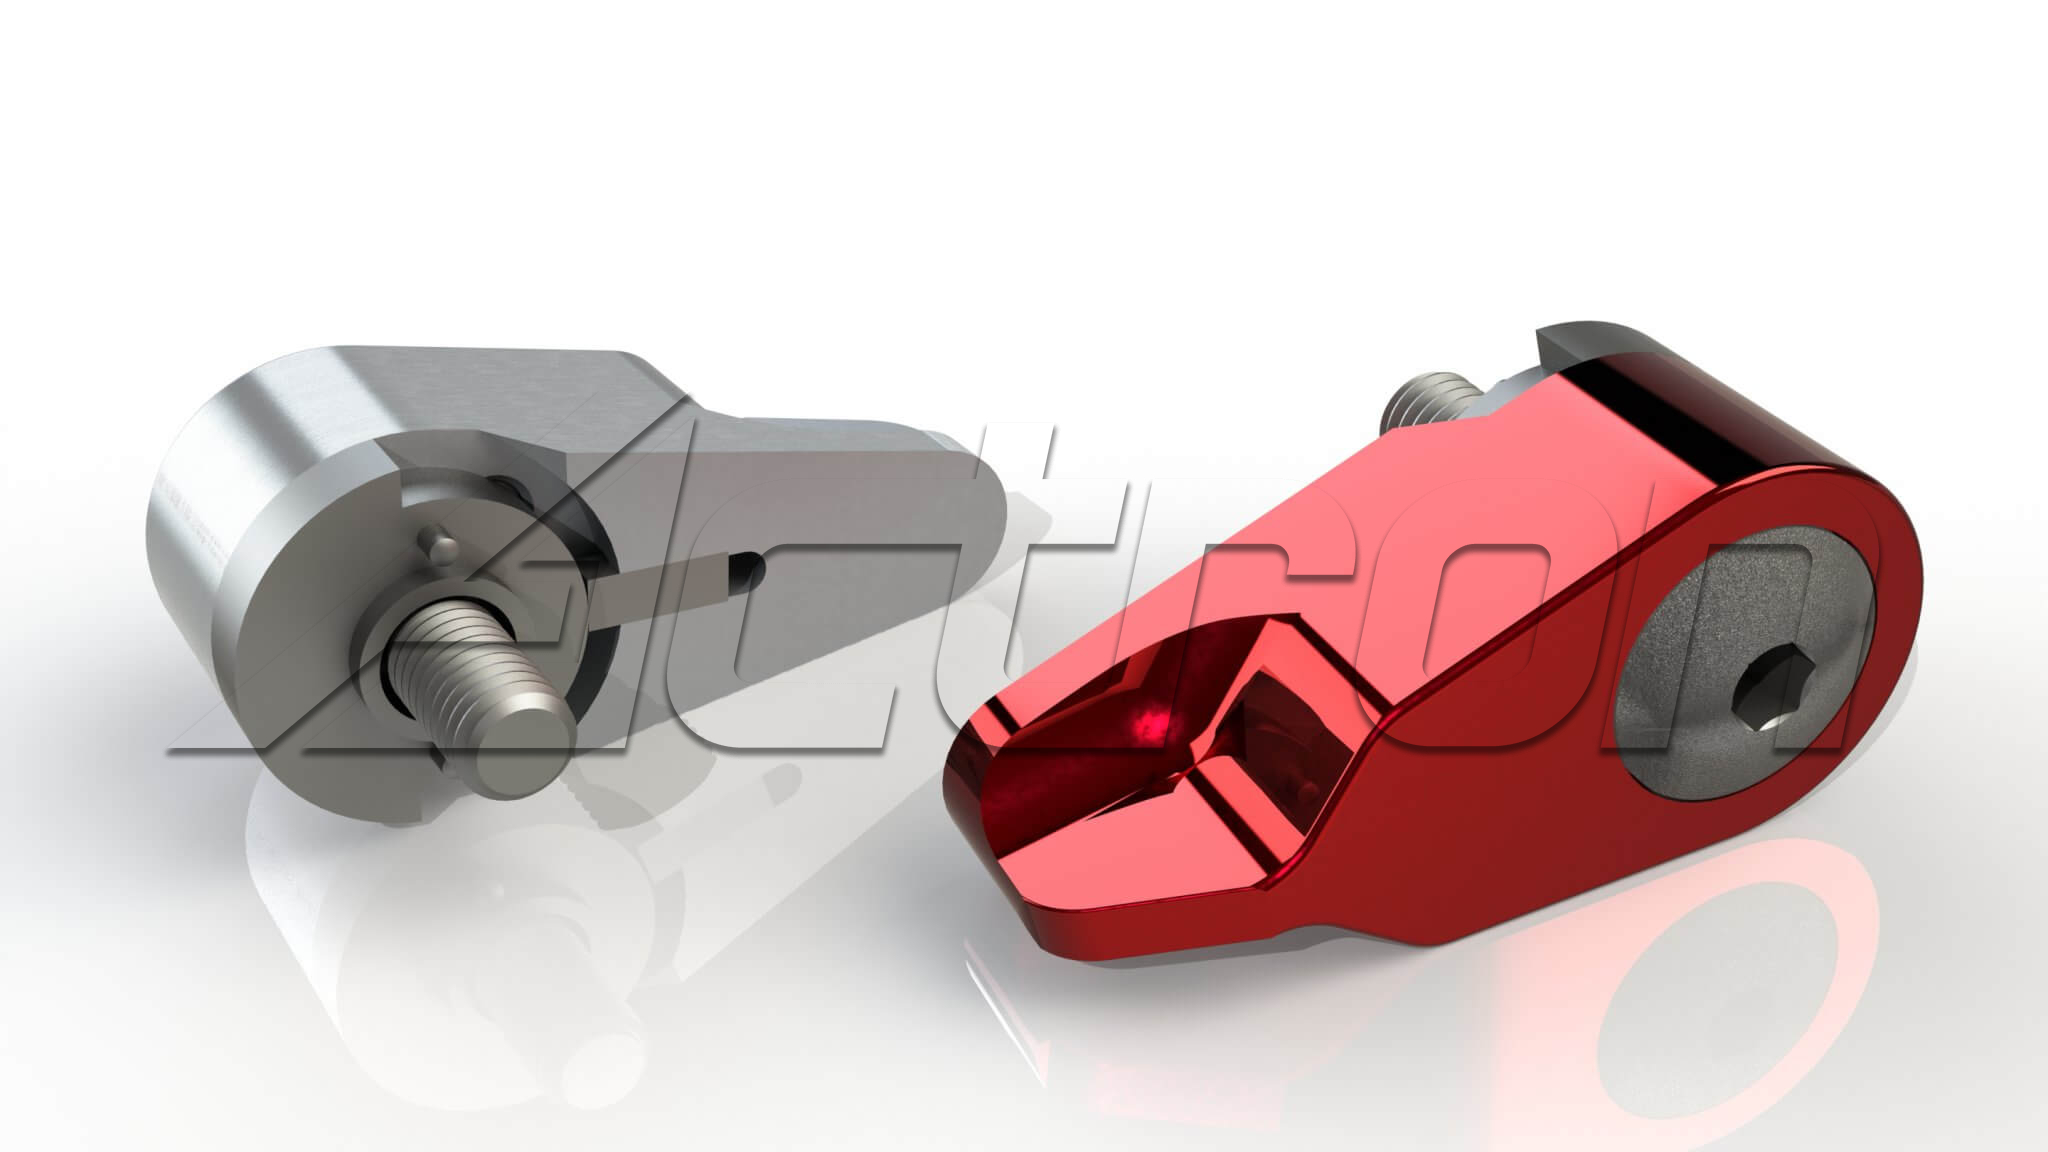 1-4-turn-retainer-4629-a35605.jpg